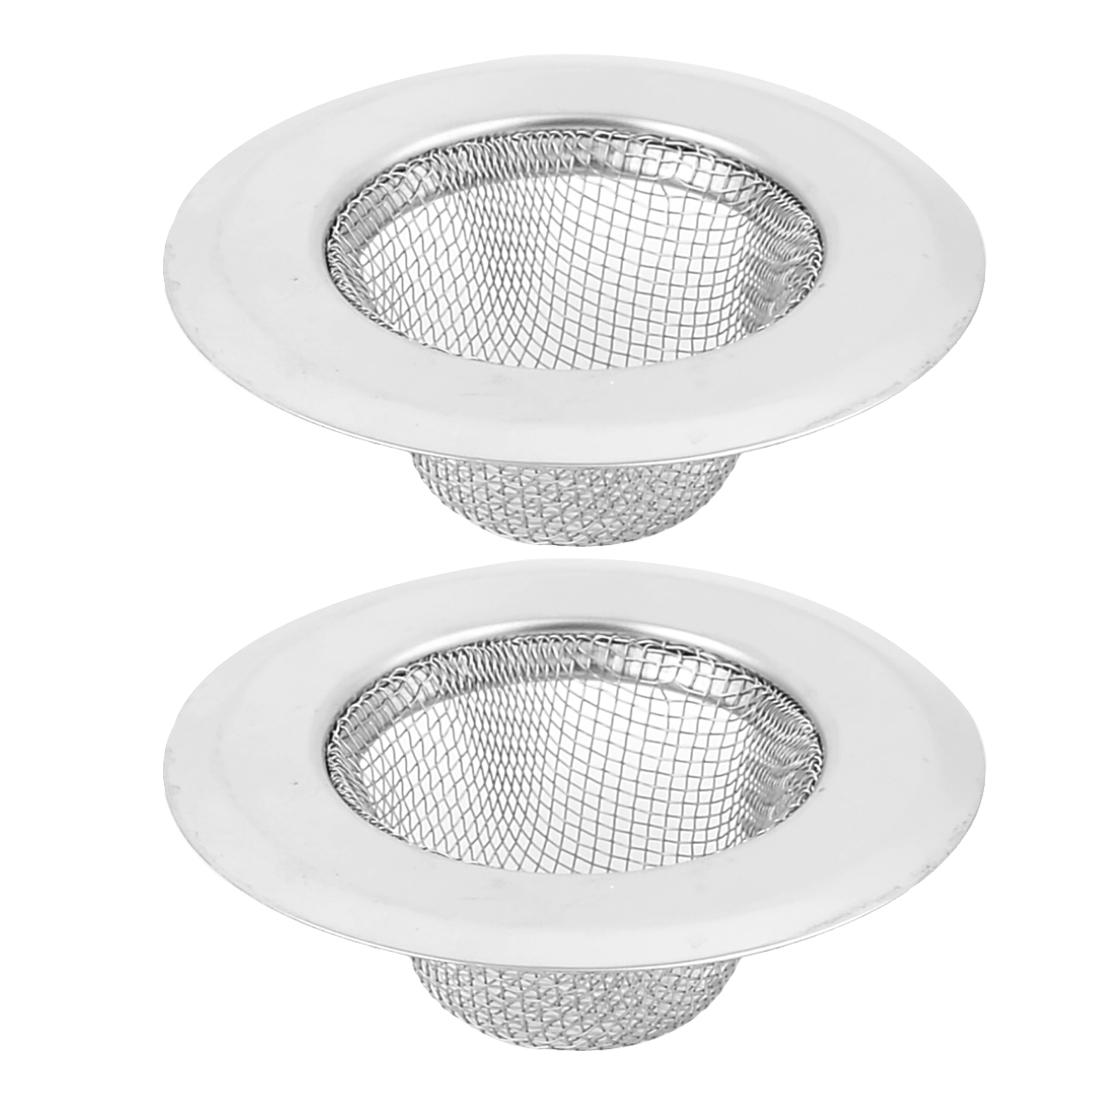 Kitchen Sink Bath Basin Mesh Drainer Strainer 7cm Dia 2pcs